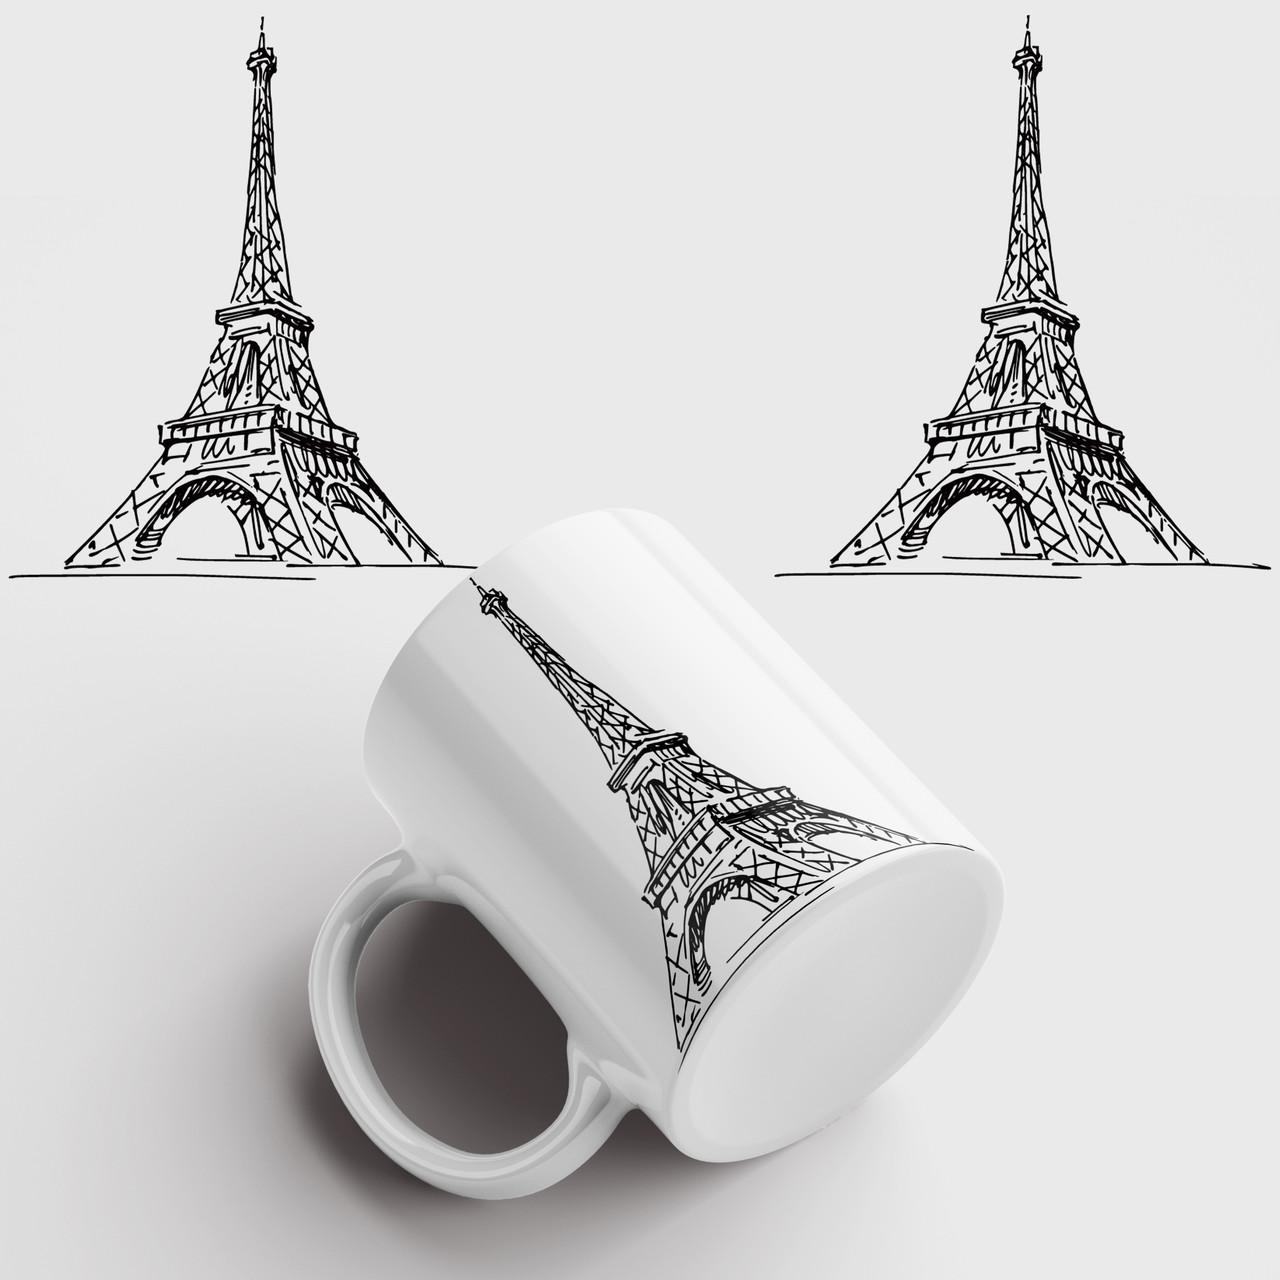 Чашка з принтом Ейфелева Вежа 2